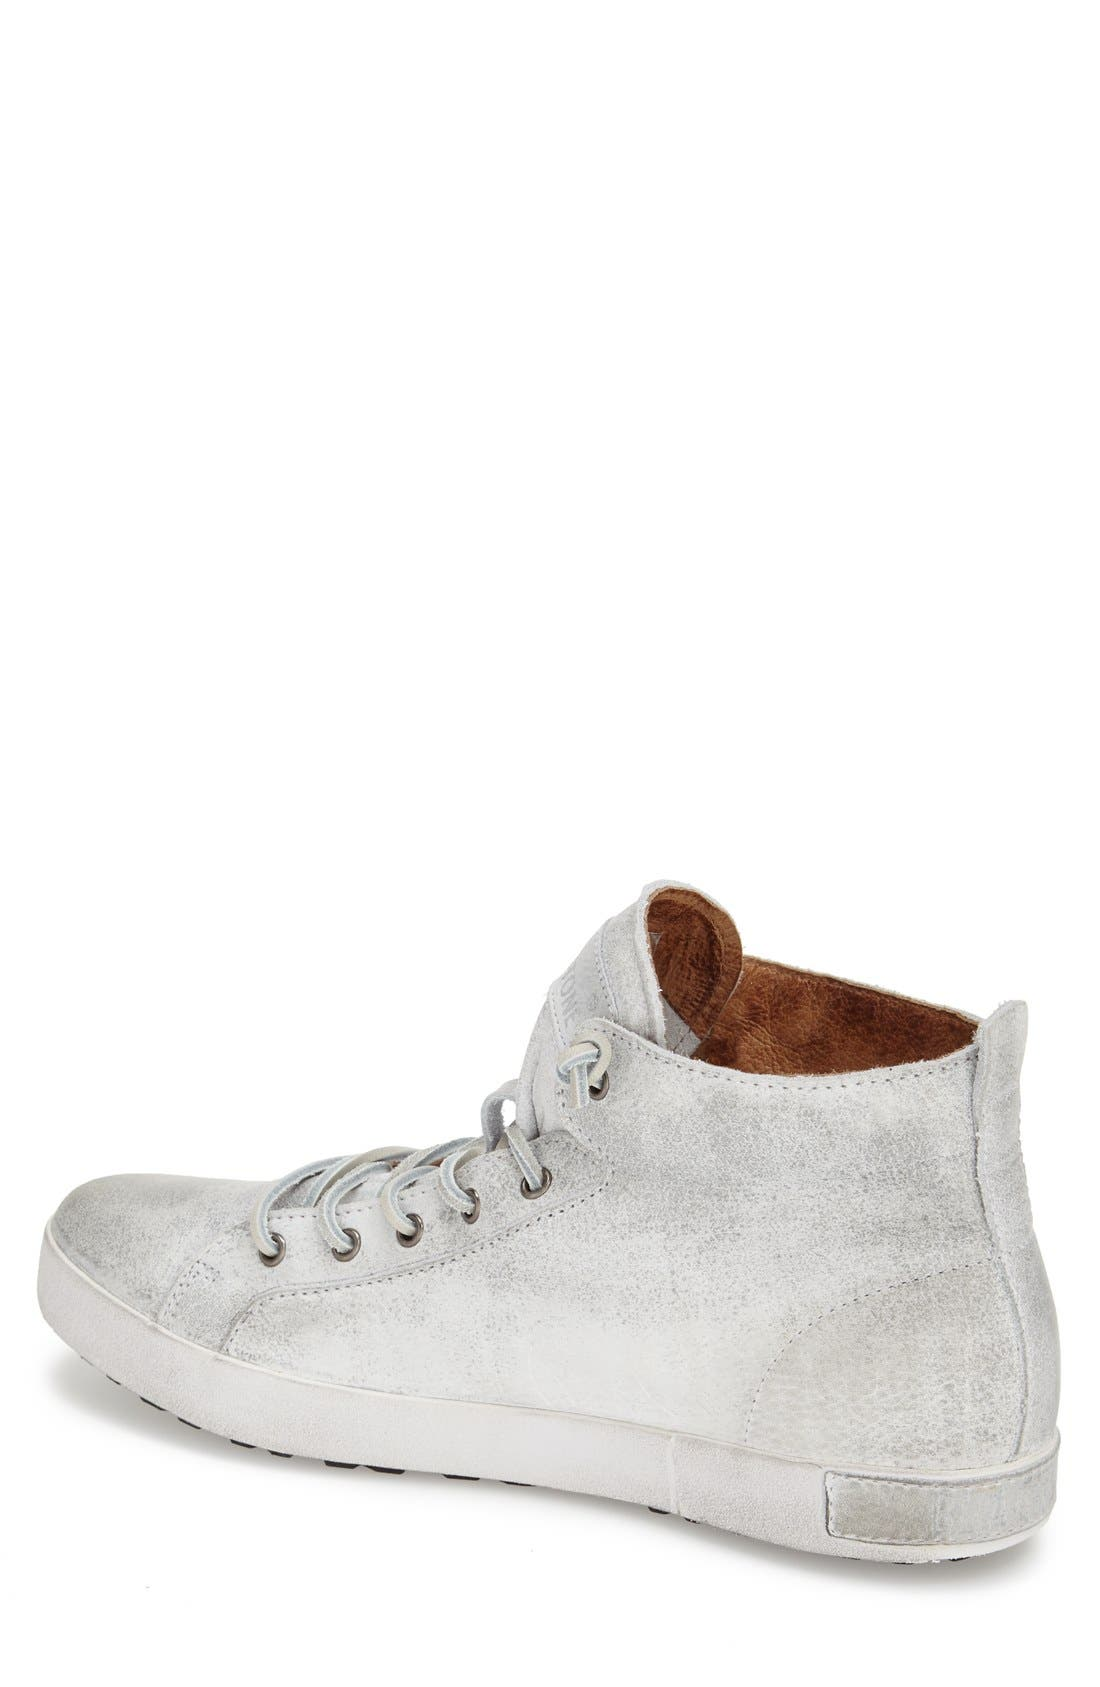 'JM 02' High Top Sneaker,                             Alternate thumbnail 3, color,